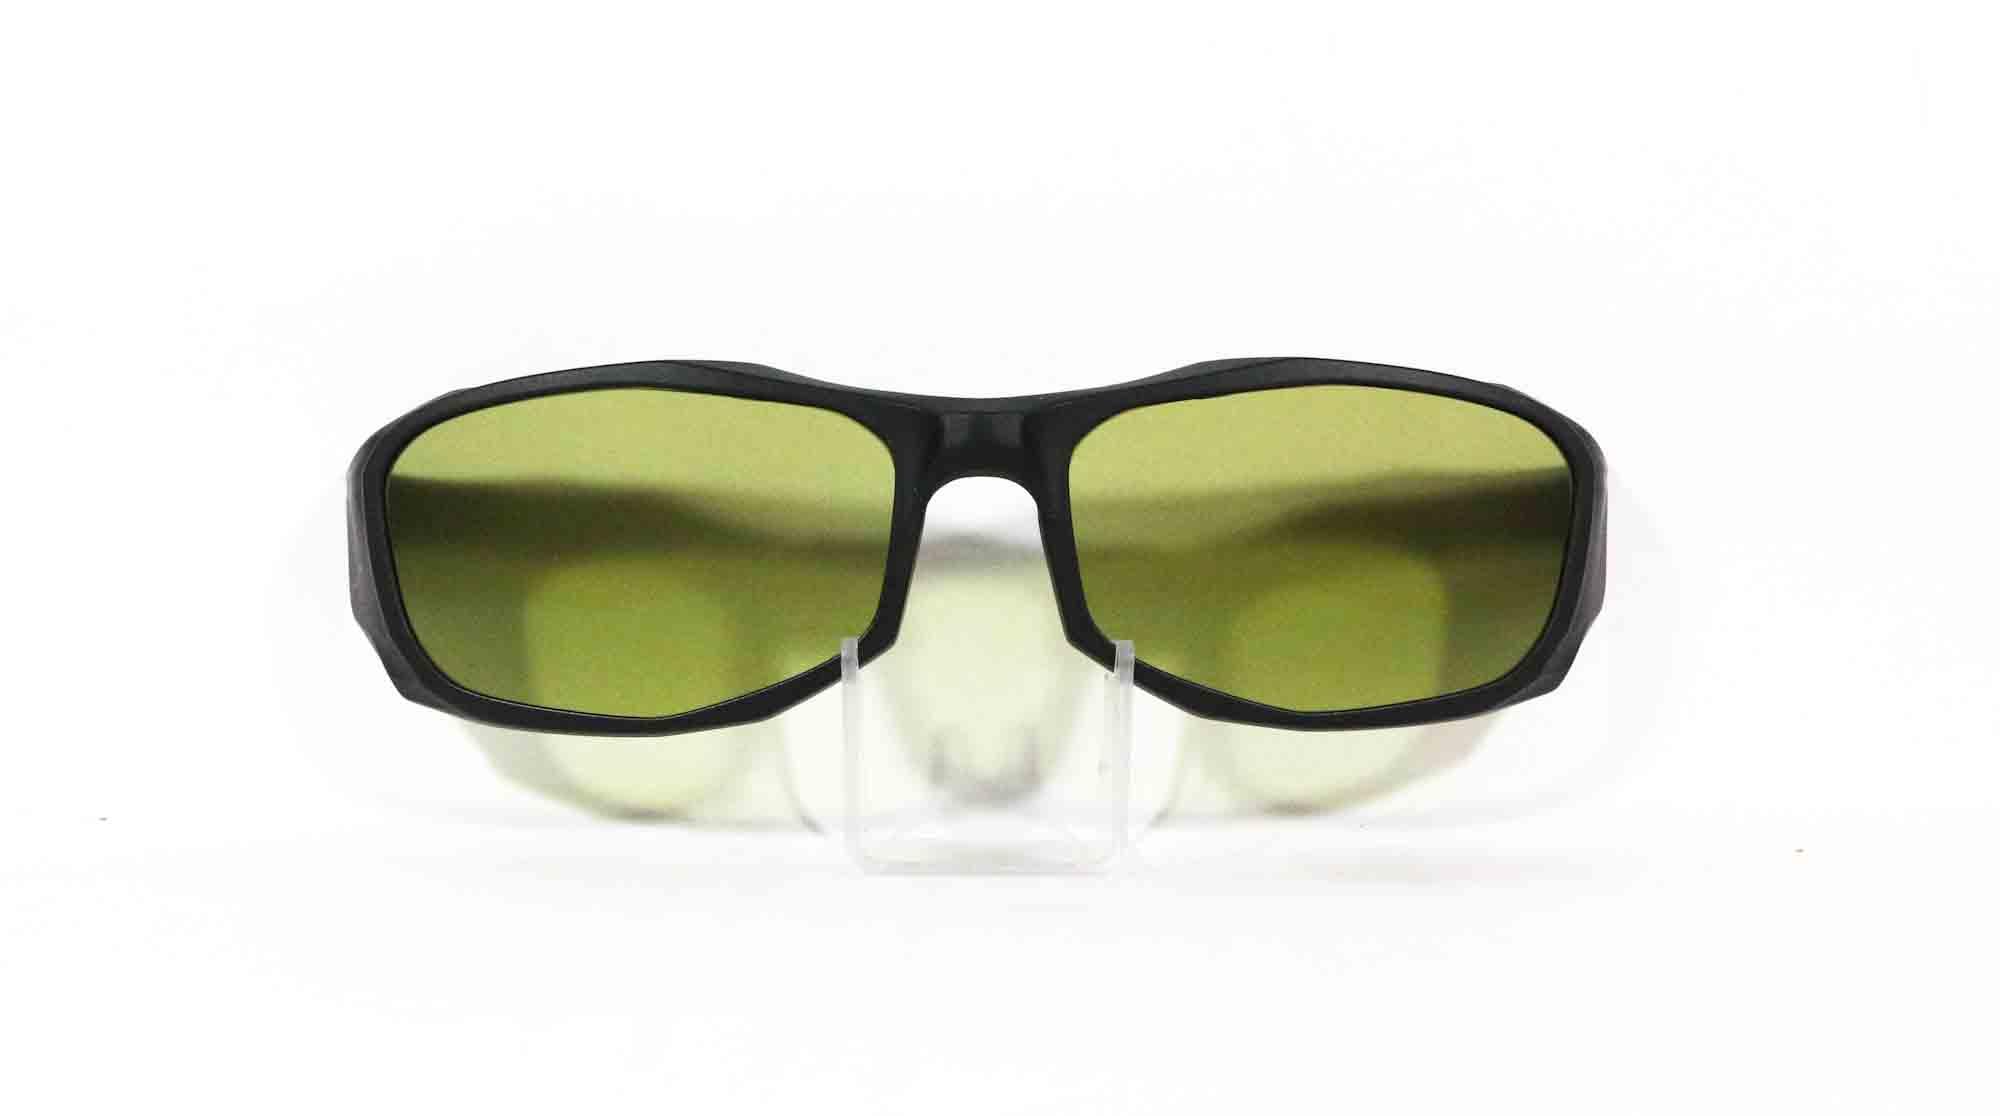 Zeal Polarised Fishing Sunglasses Baron Jacket F-1651 Ease Green / Blk (8454)